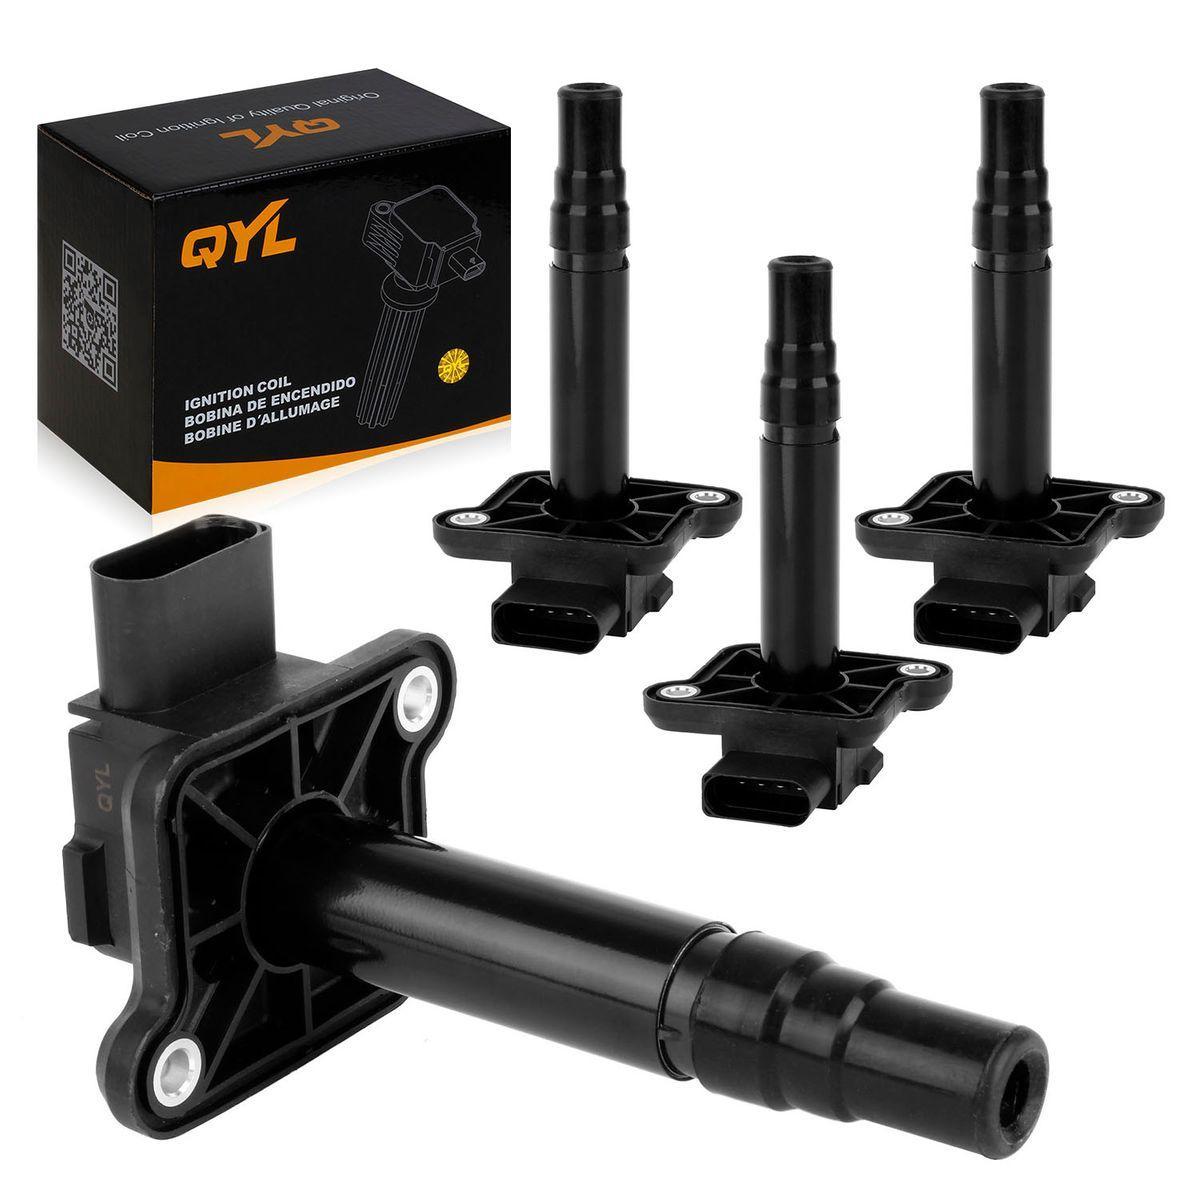 Ignition Coil Engine Light: 4PCS Ignition Coil Pack For VW Beetle Passat L4 1.8L Turbo